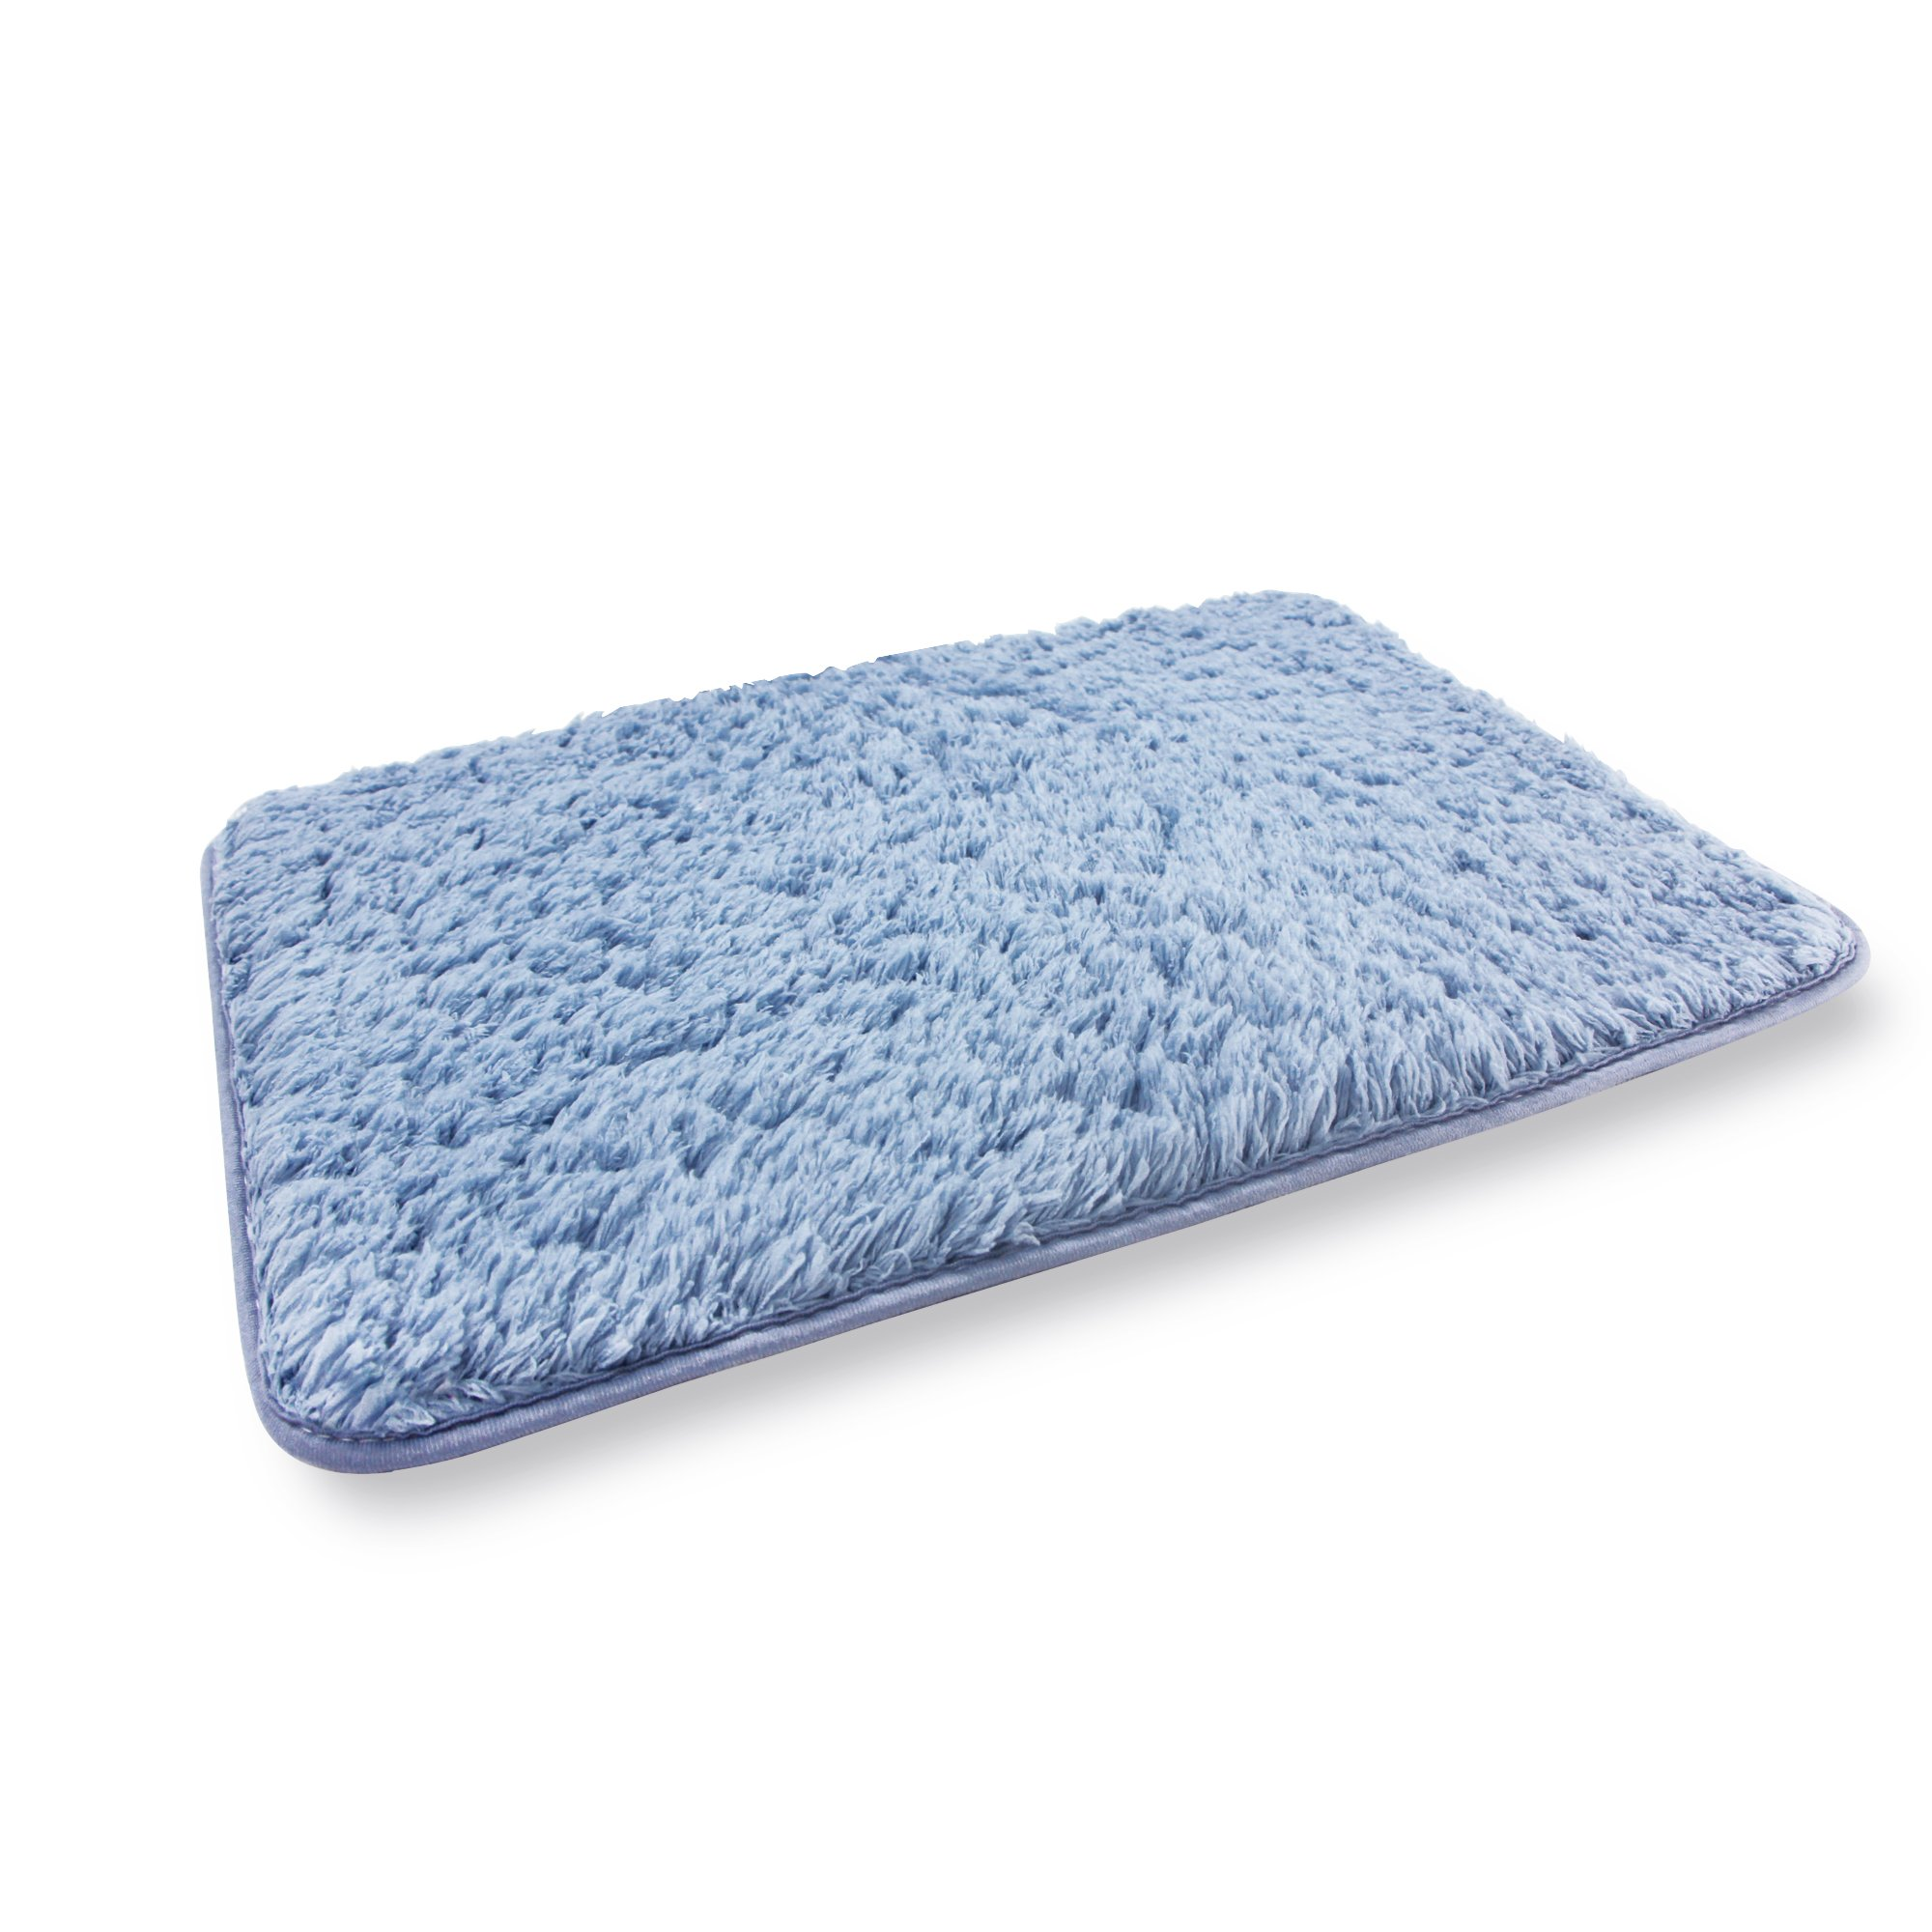 Soft Microfiber Non-slip Antibacterial Rubber Luxury Bath Mat Rug 20''X32'' Blue